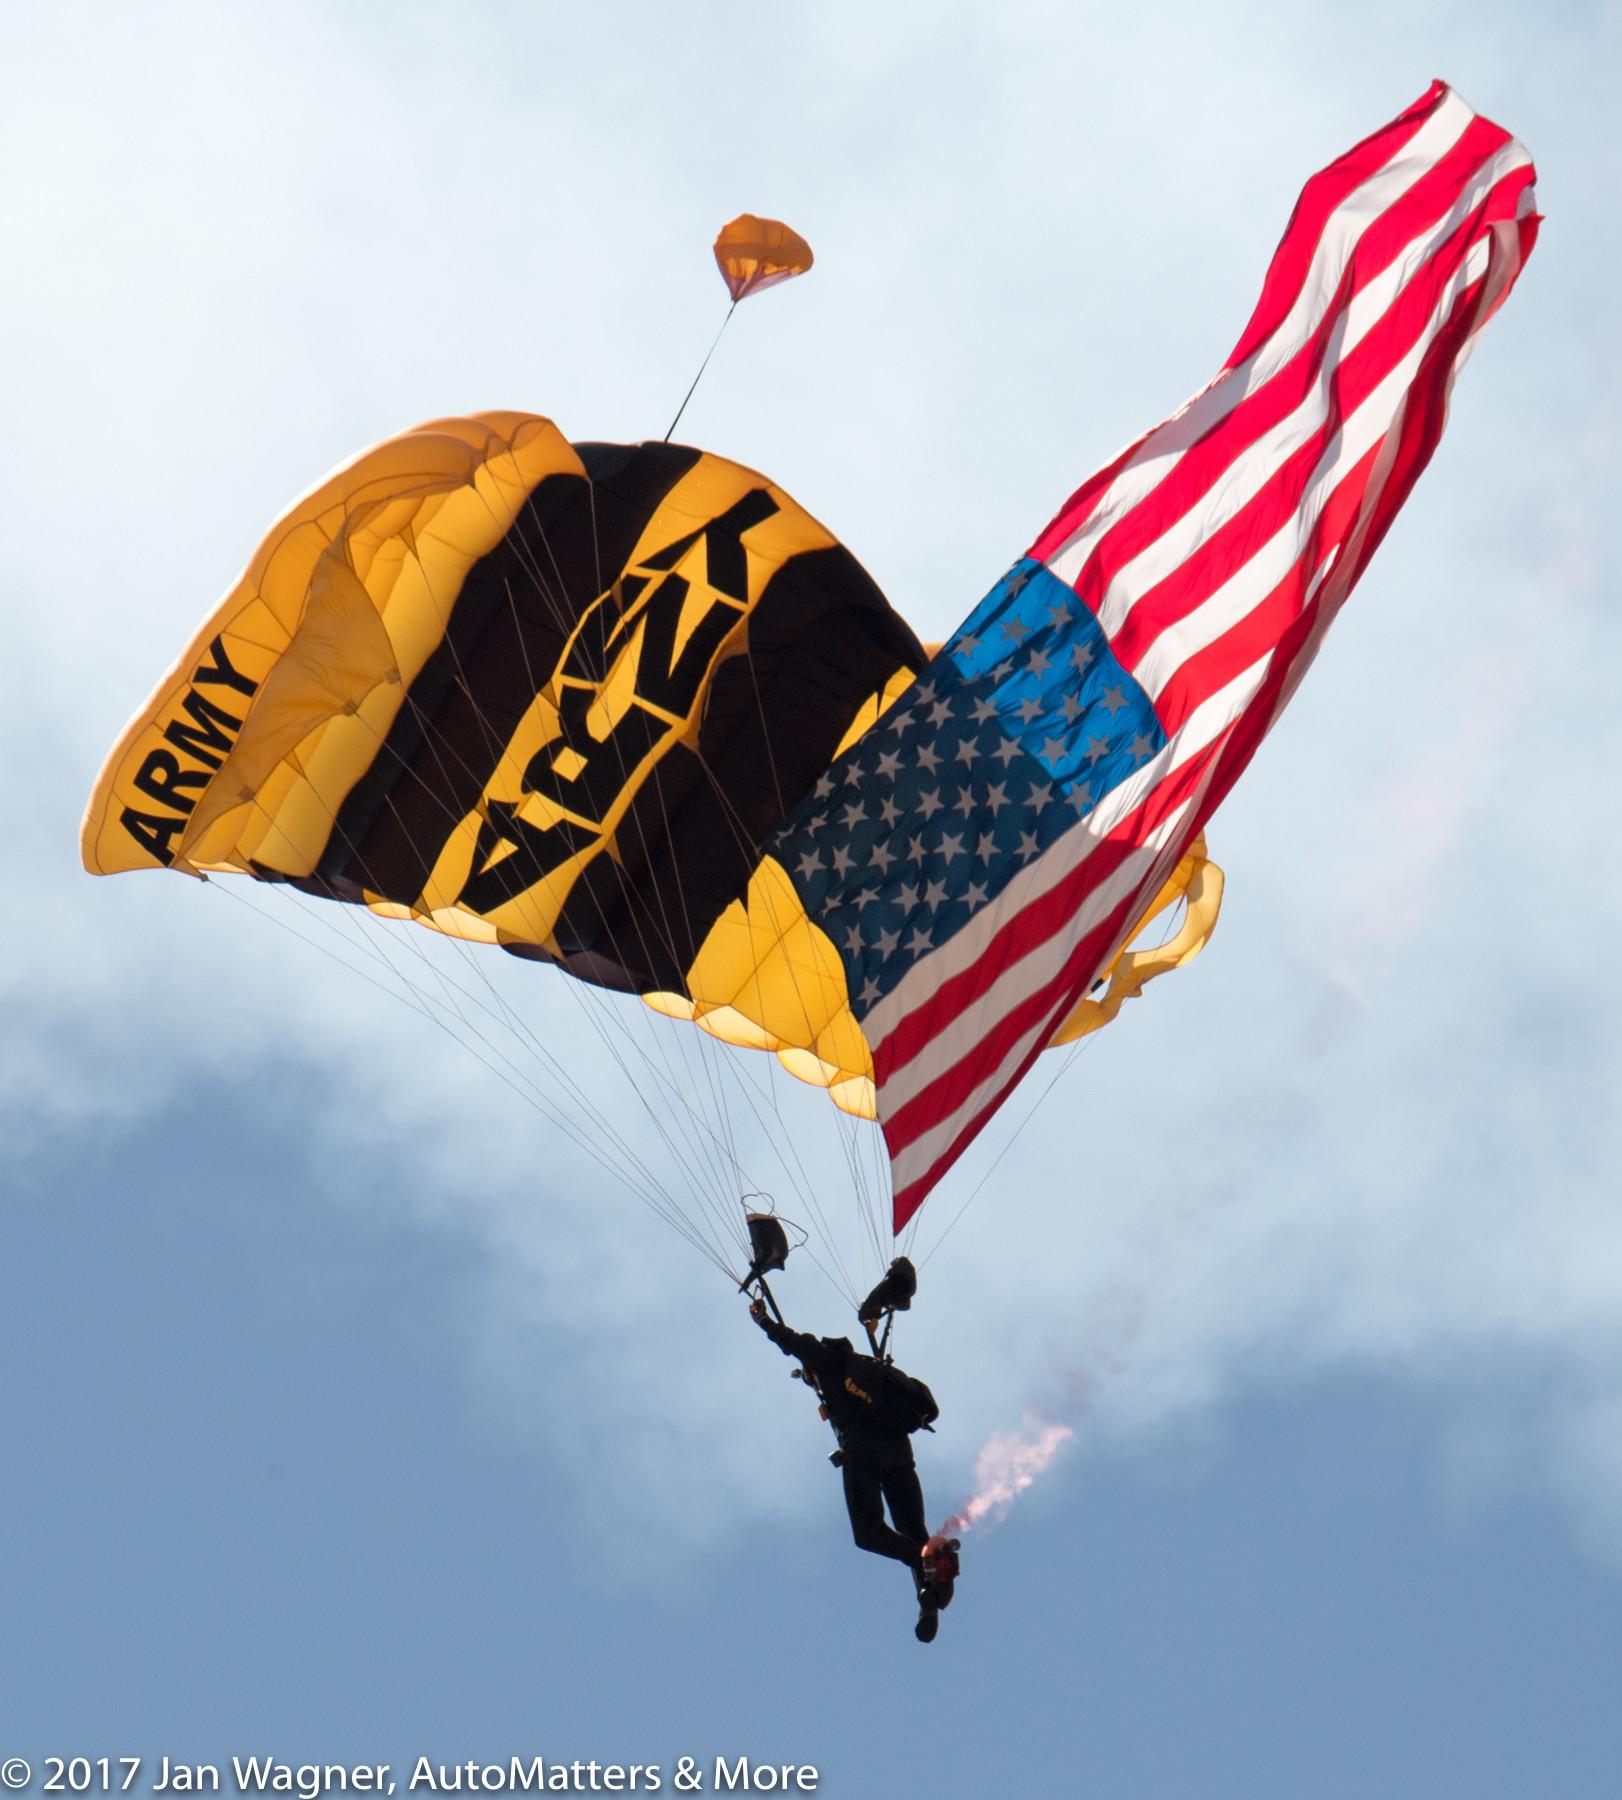 U.S. Army Golden Knights parachute team member